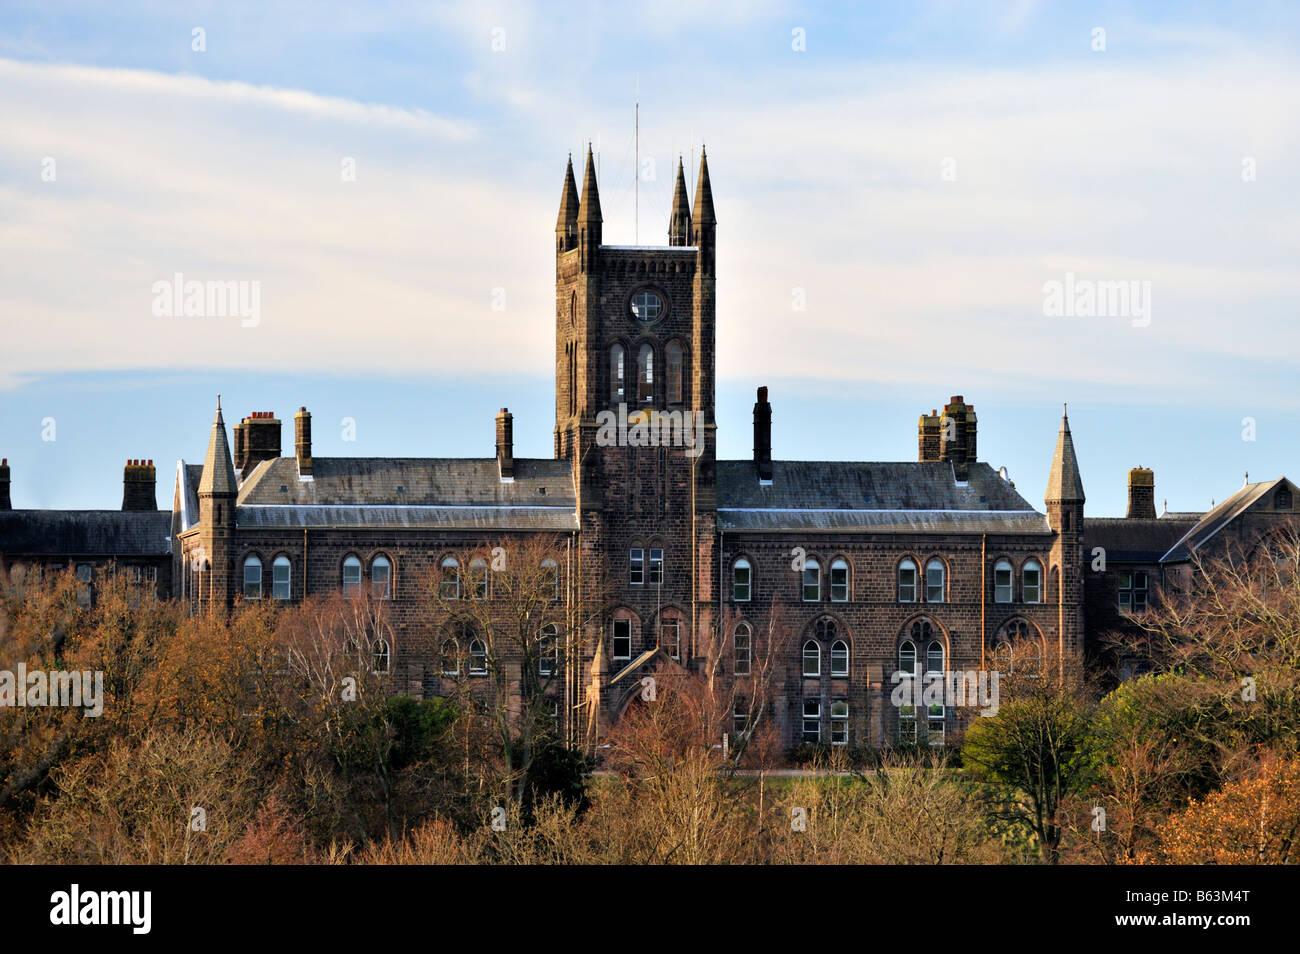 lancaster-moor-hospital-the-former-lancashire-county-asylum-lancaster-B63M4T.jpg